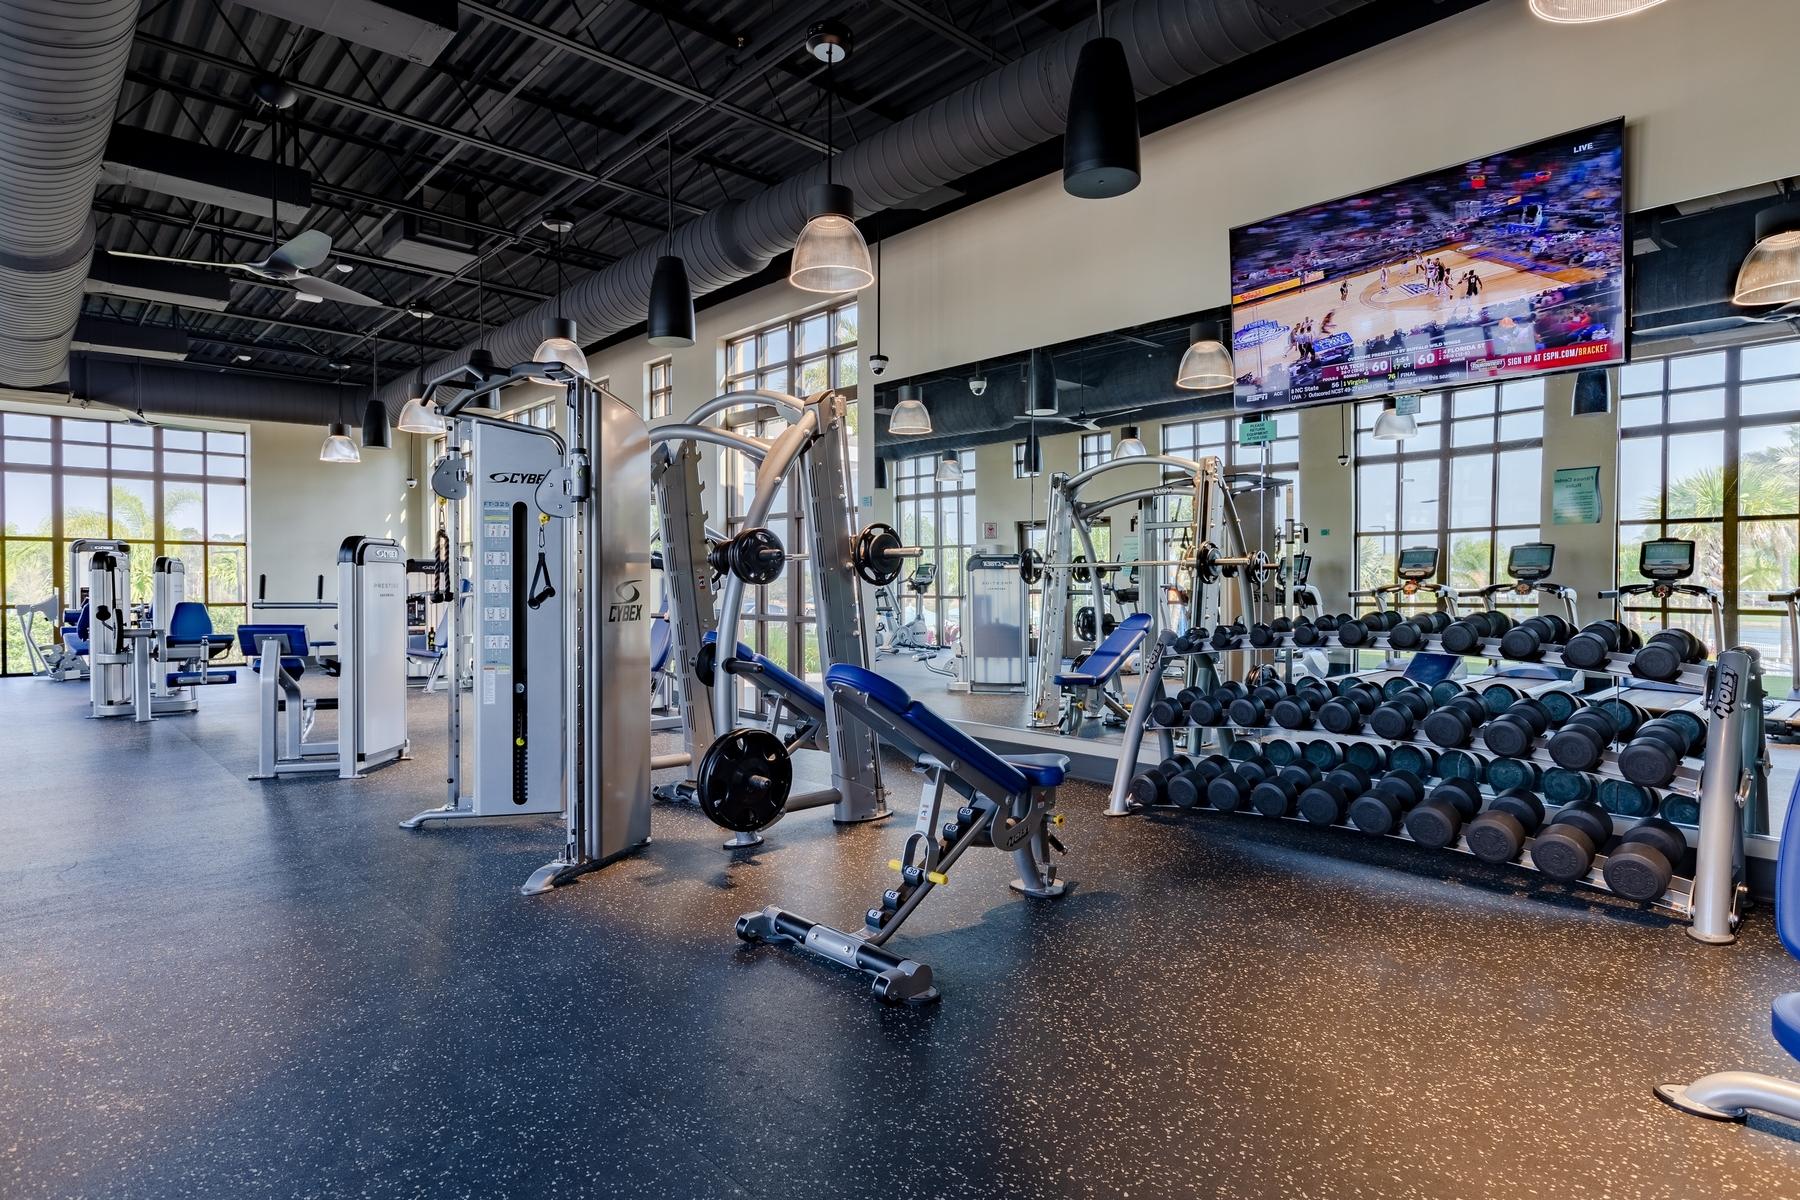 Solara Fitness Center